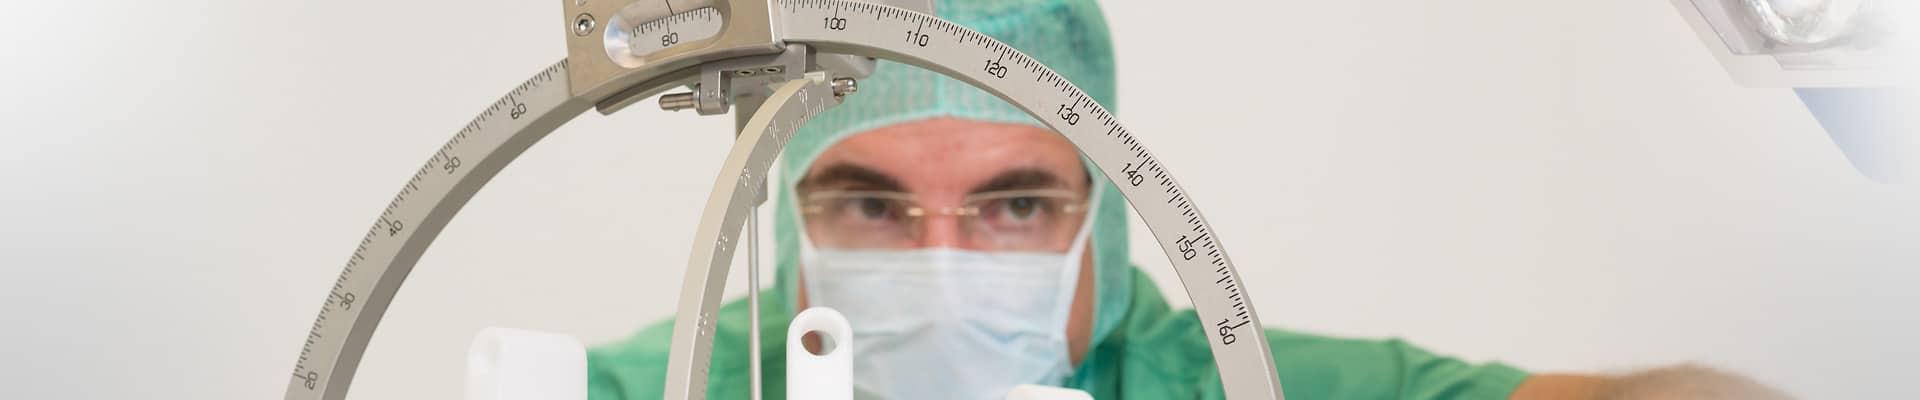 Neurochirurgie-Neuroradiologie-3